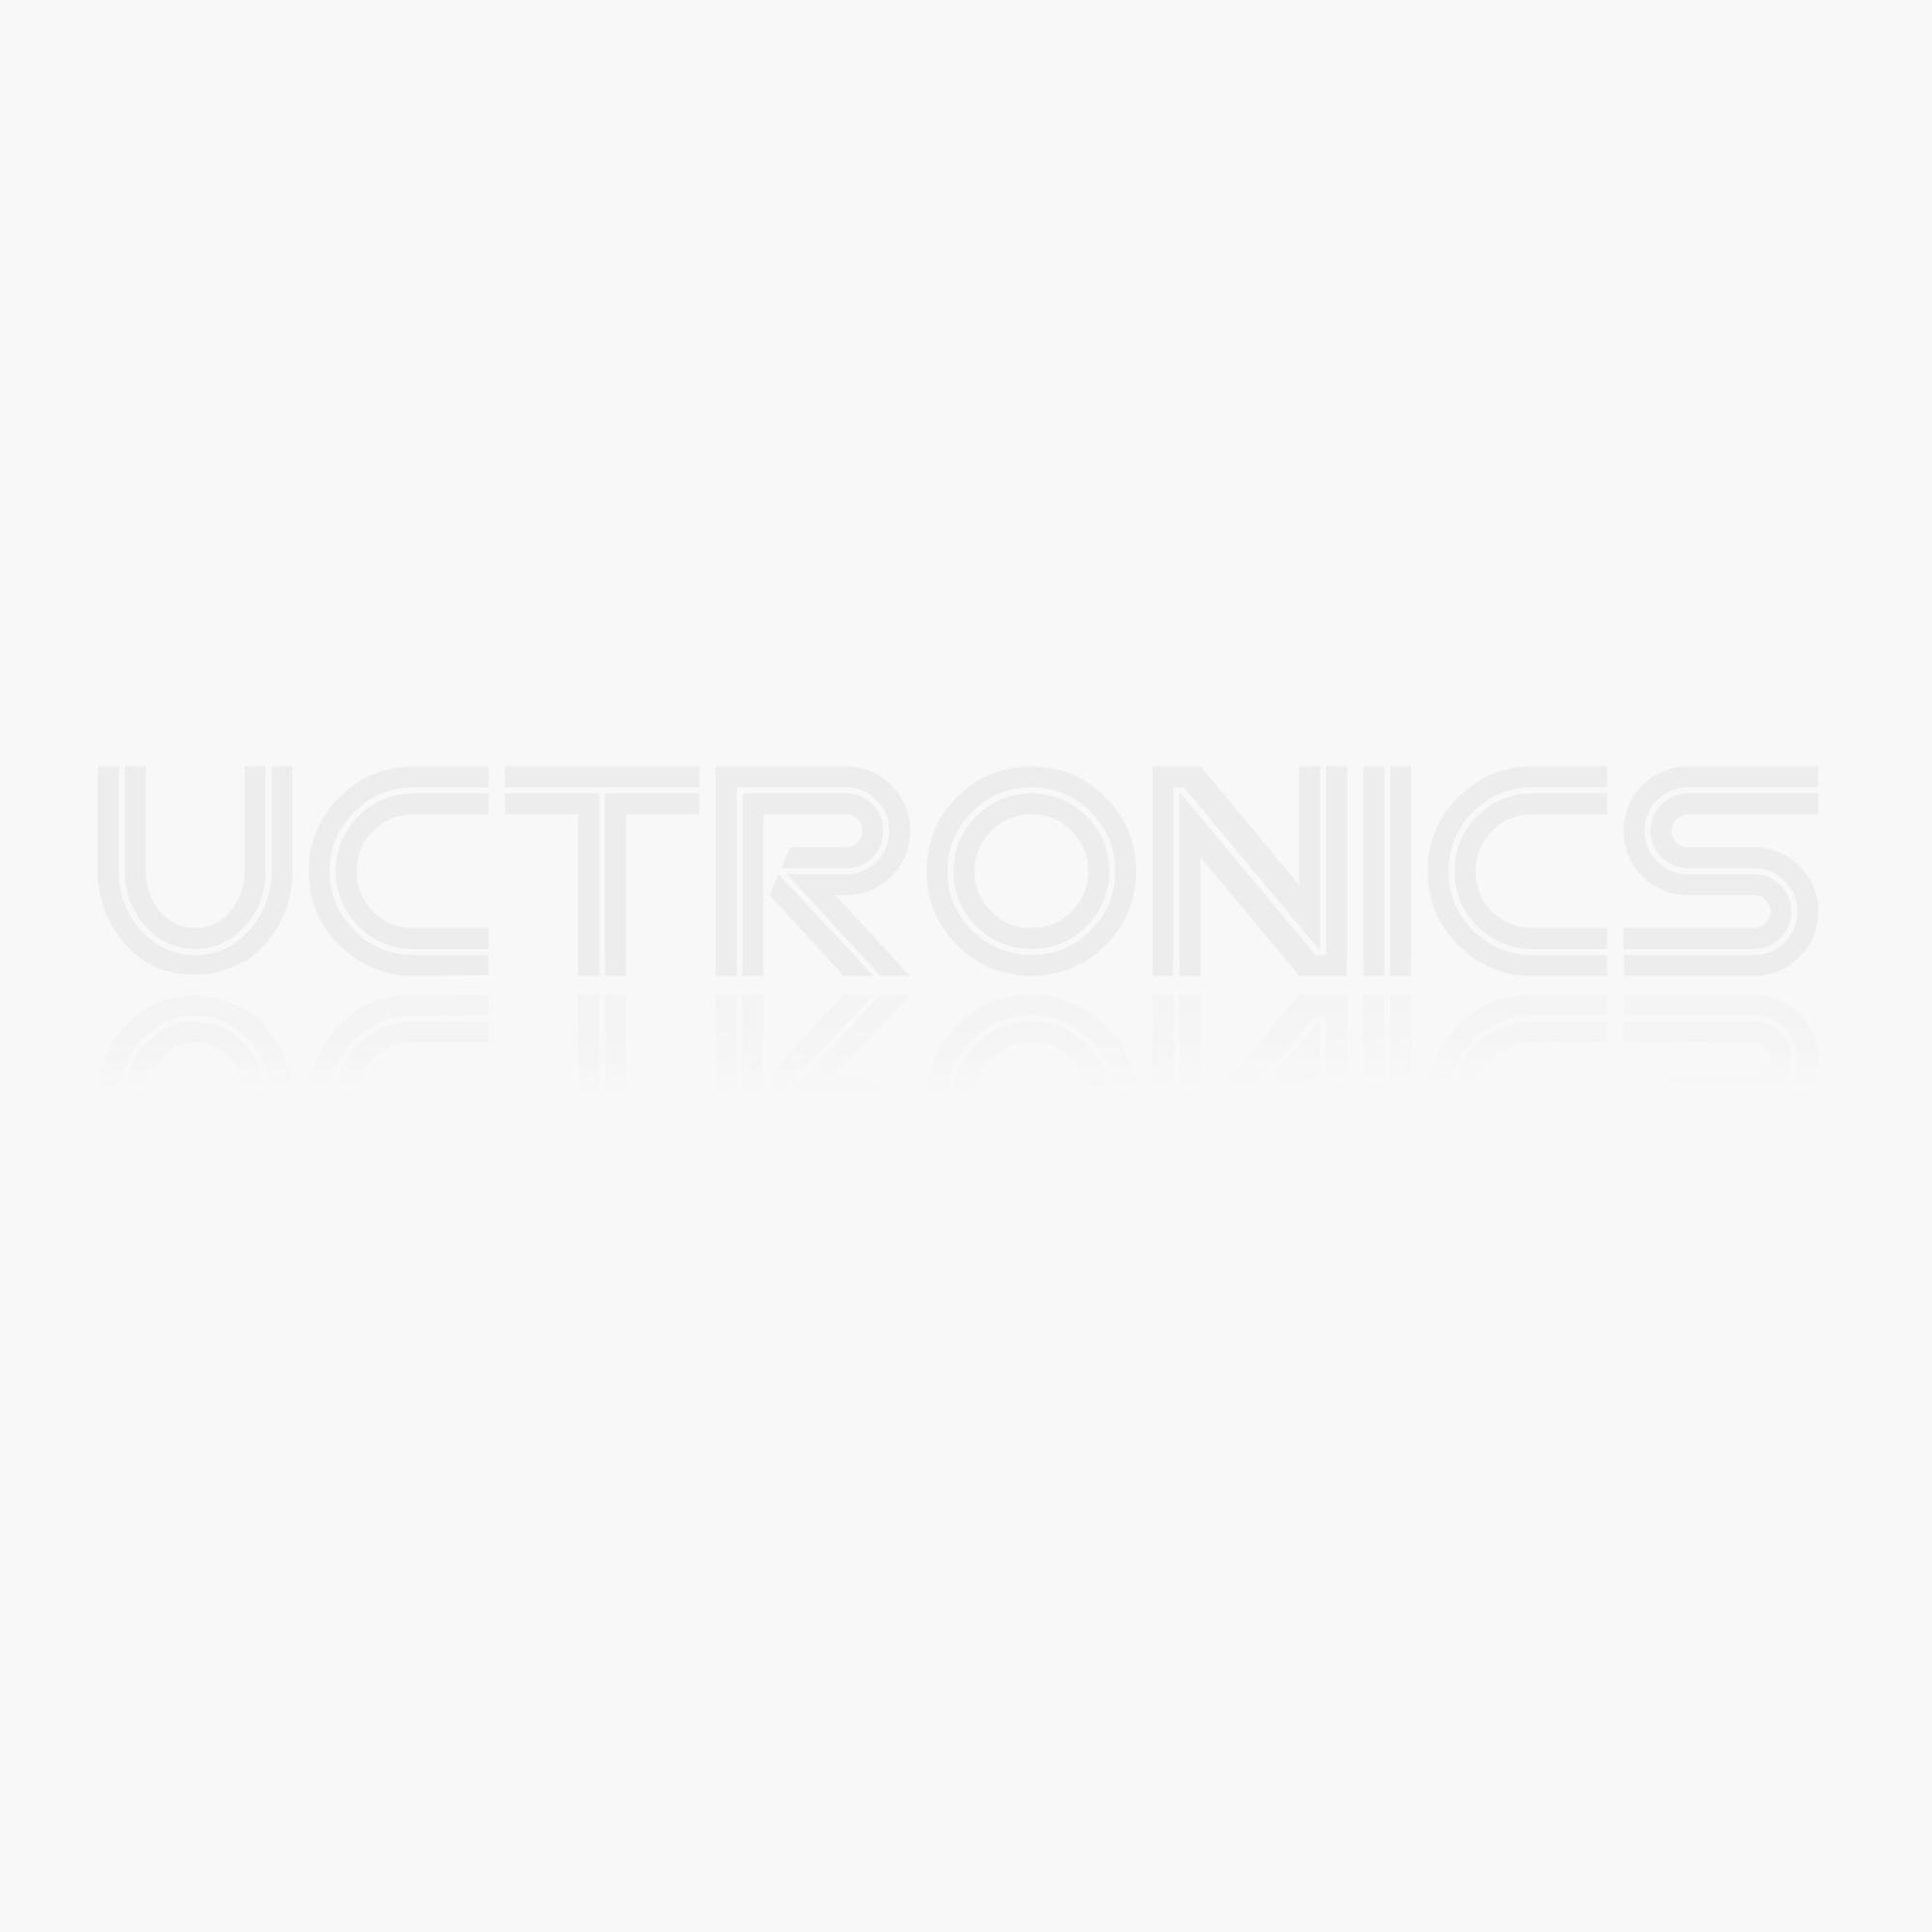 5pcs 74LS138 DIP-16 DIP 16pin Decoder IC Chip